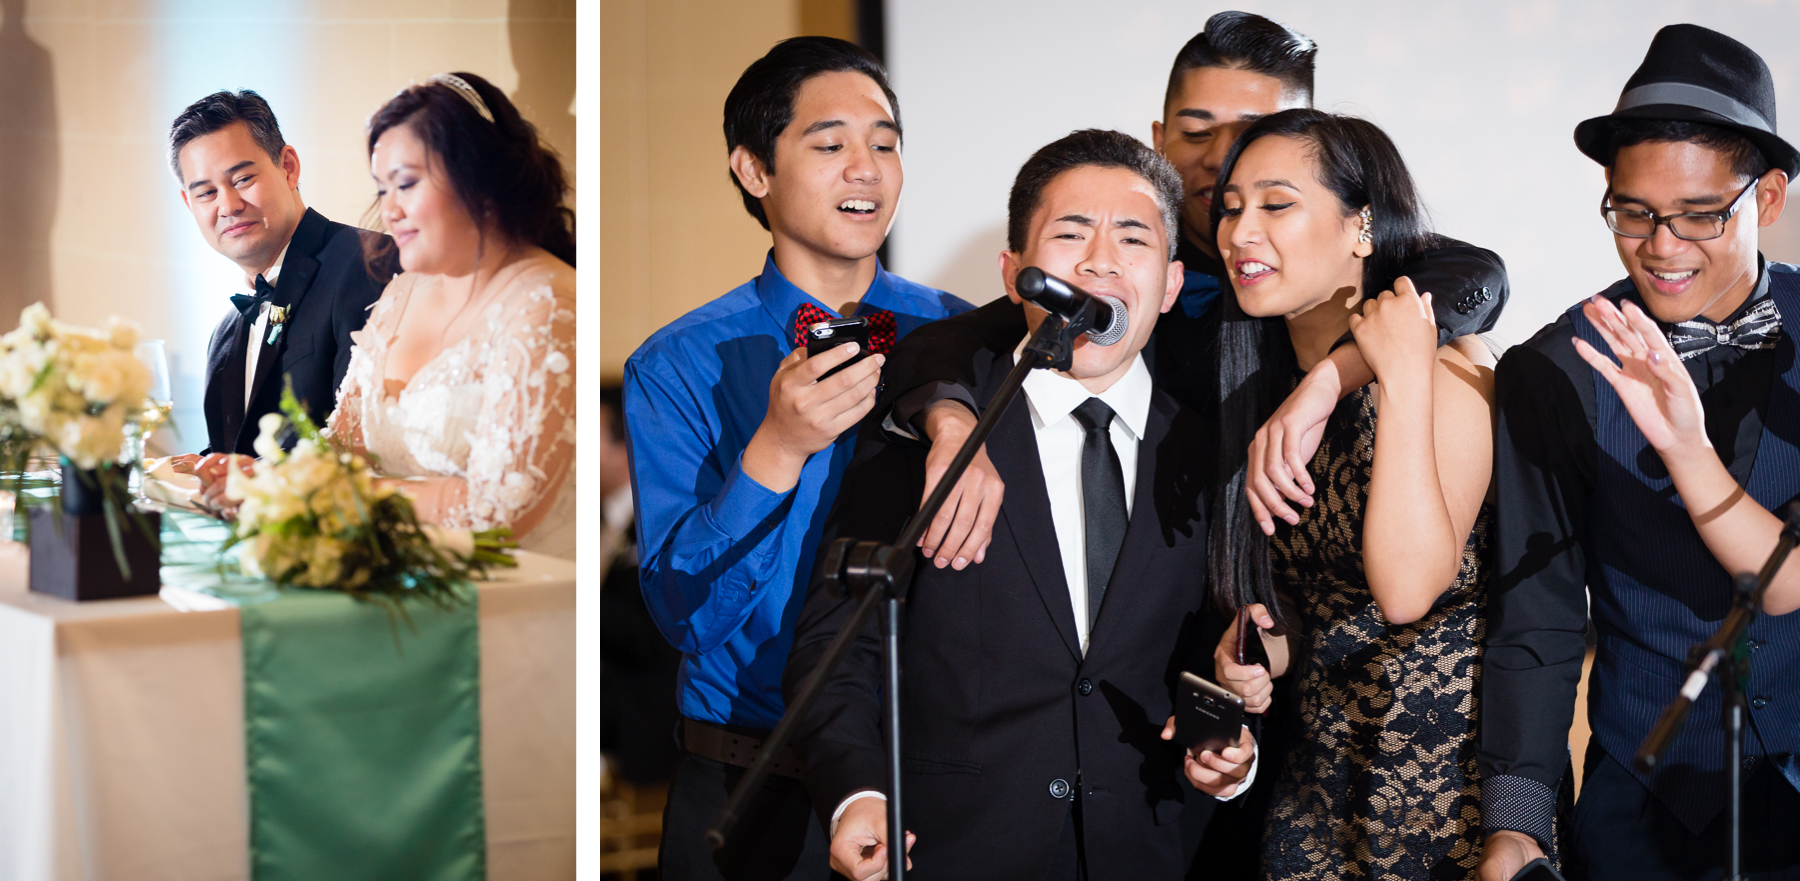 wedding-photographer-texas.jpg